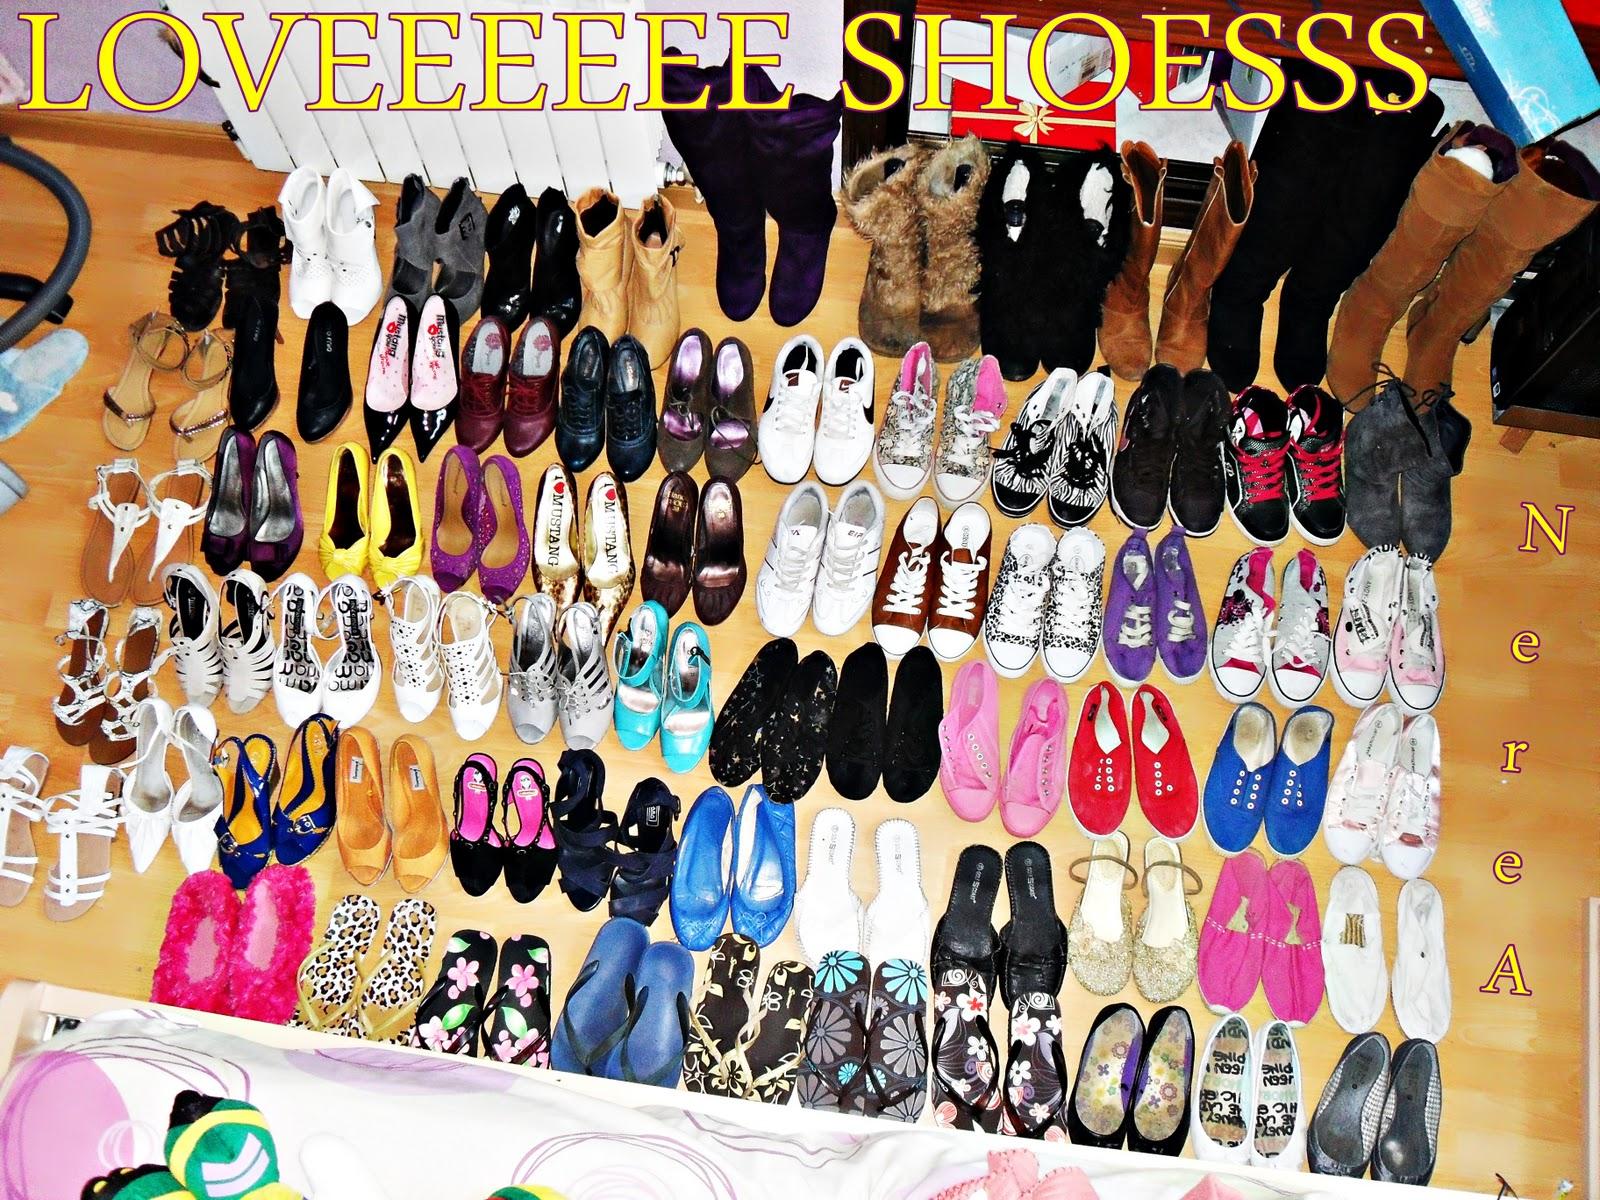 http://2.bp.blogspot.com/_qVXis_ESrOU/TRfy2n3evCI/AAAAAAAAAAw/ybLUAxI2Awk/s1600/love+shoes.jpg